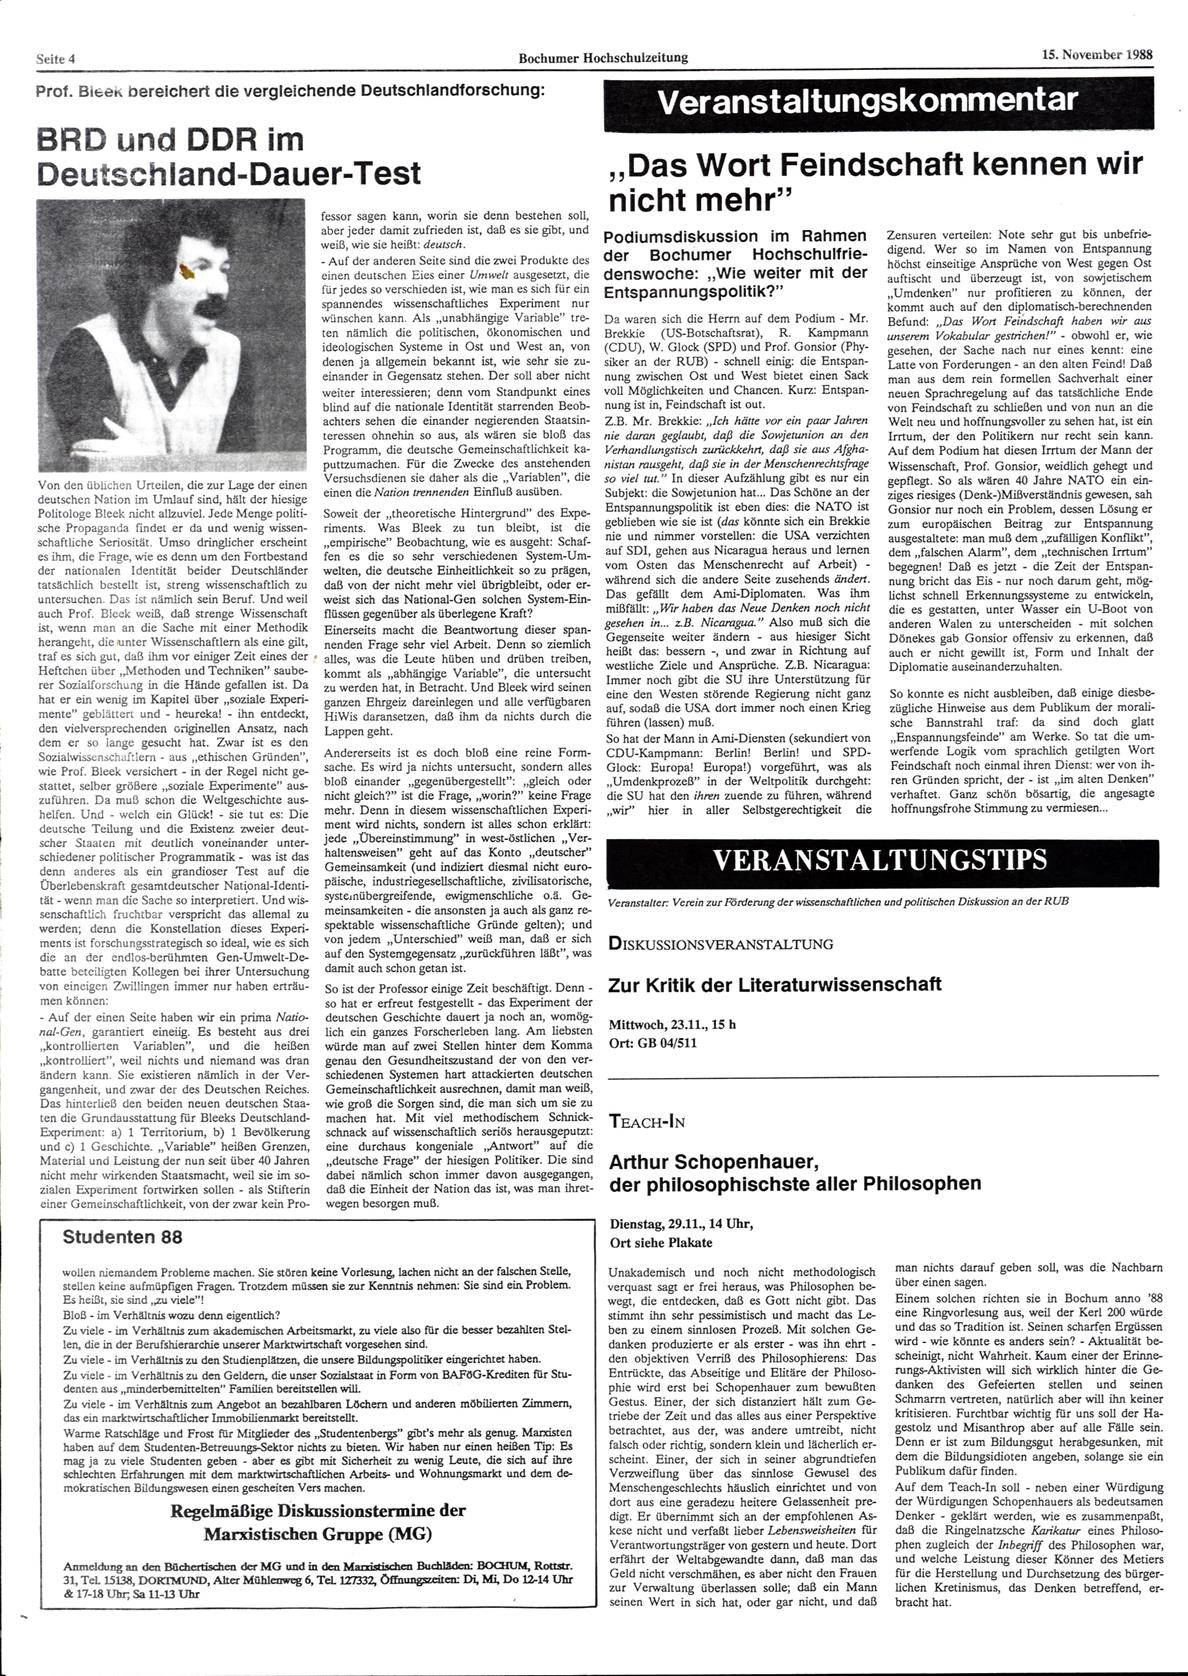 Bochum_BHZ_19881115_181_004